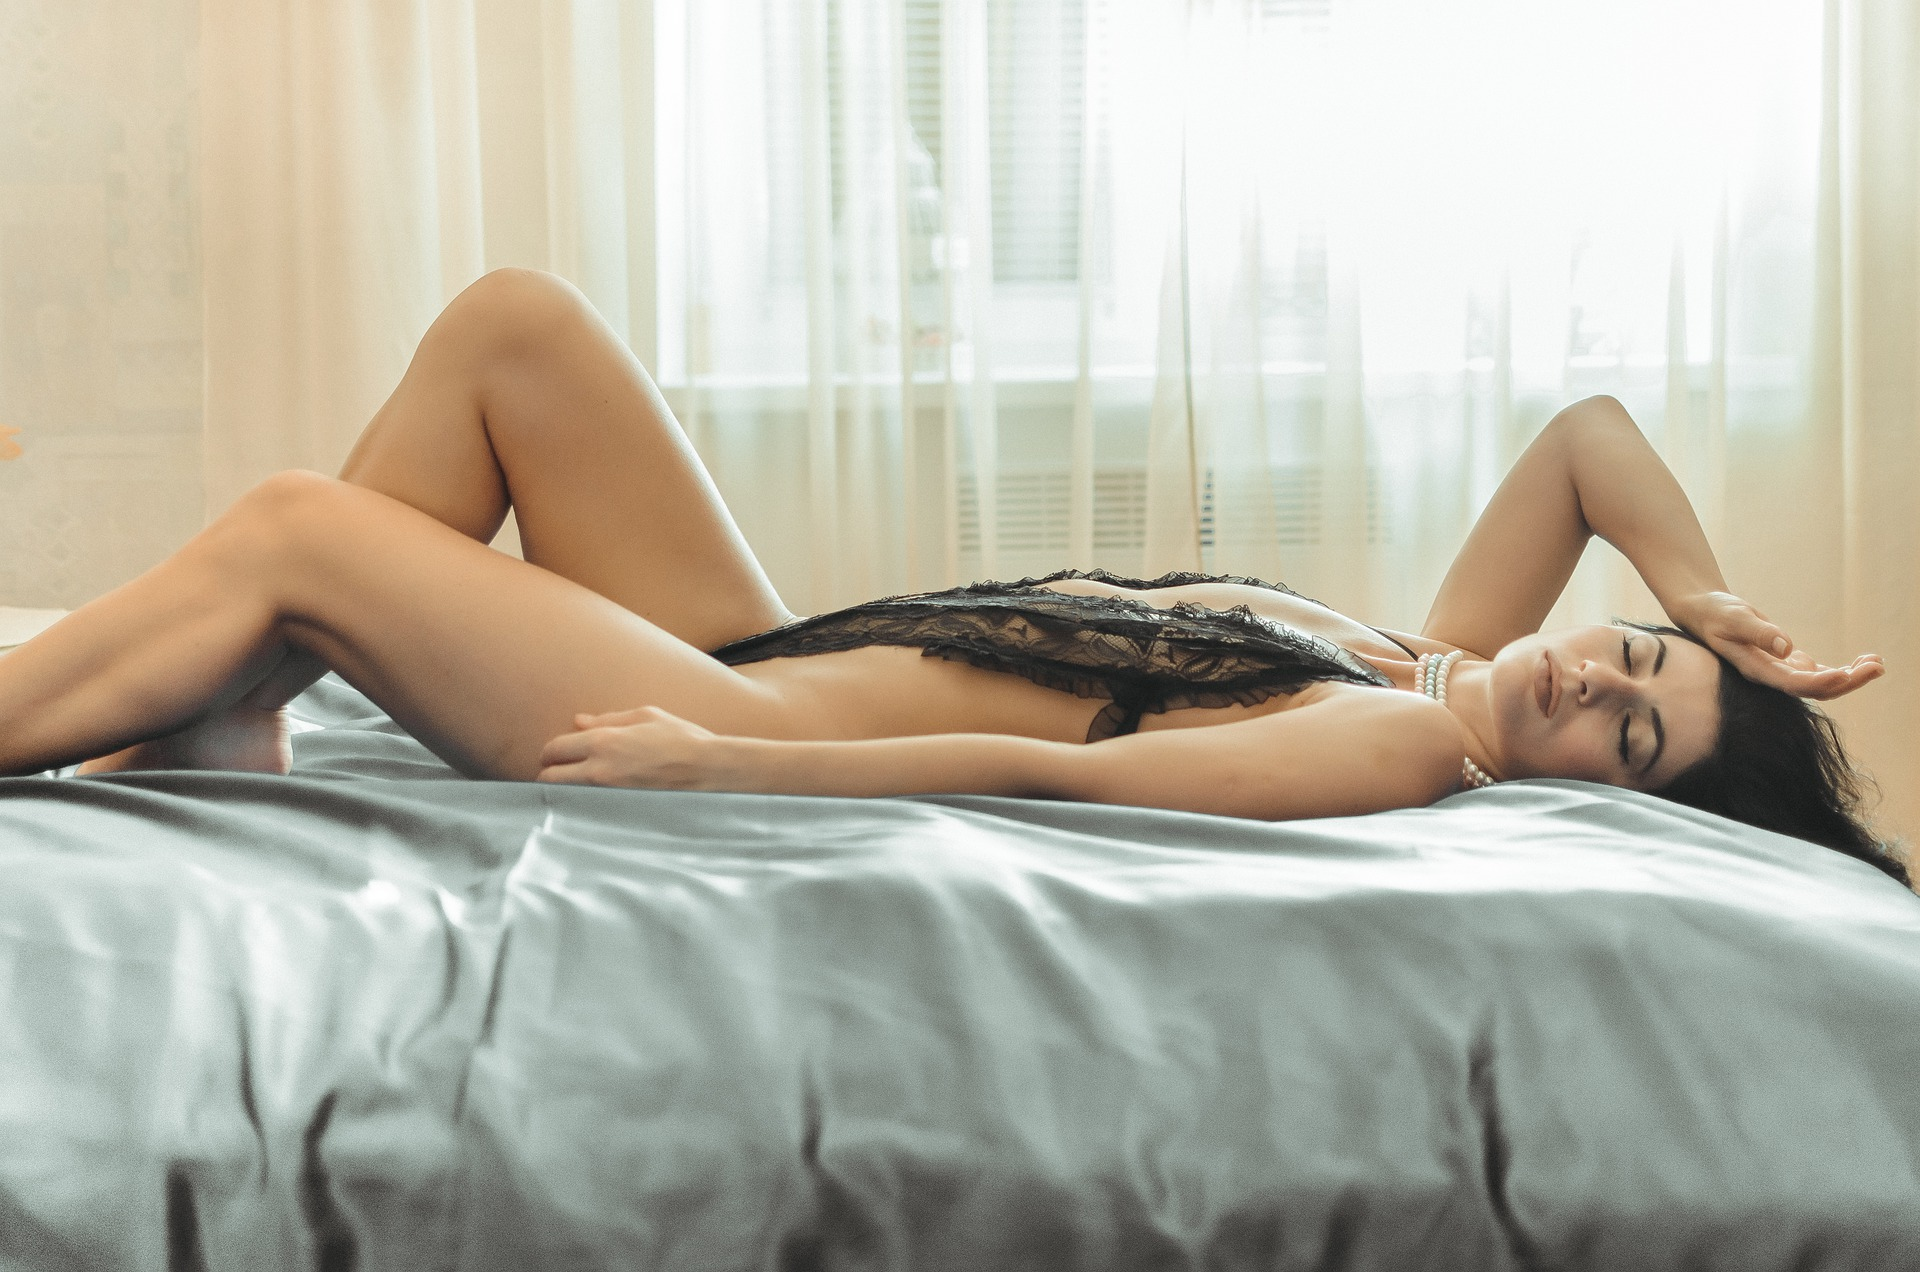 sexy-5136670_1920